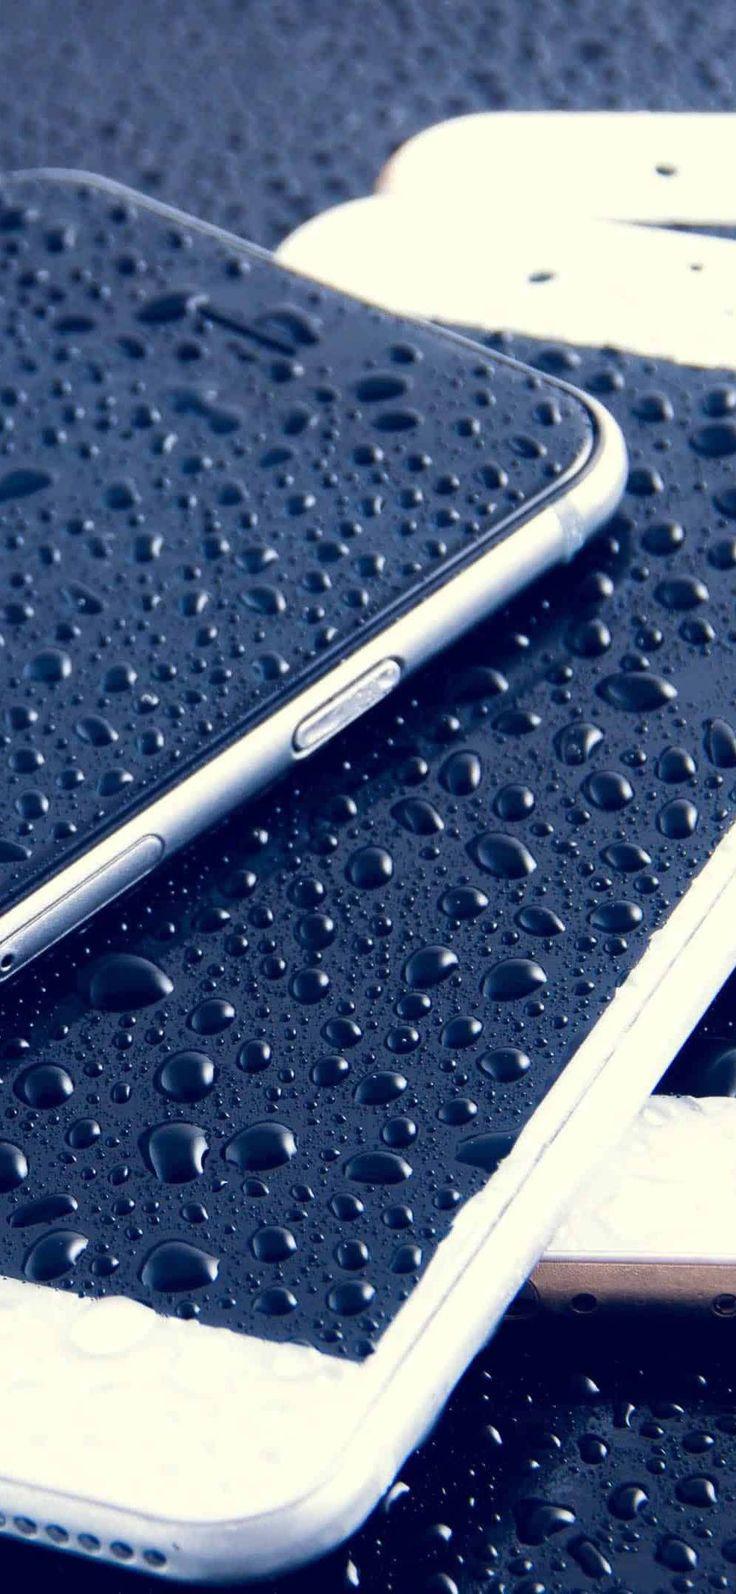 4k Resolution 4k Wallpapers For Iphone 736x1594 Wallpaper Teahub Io